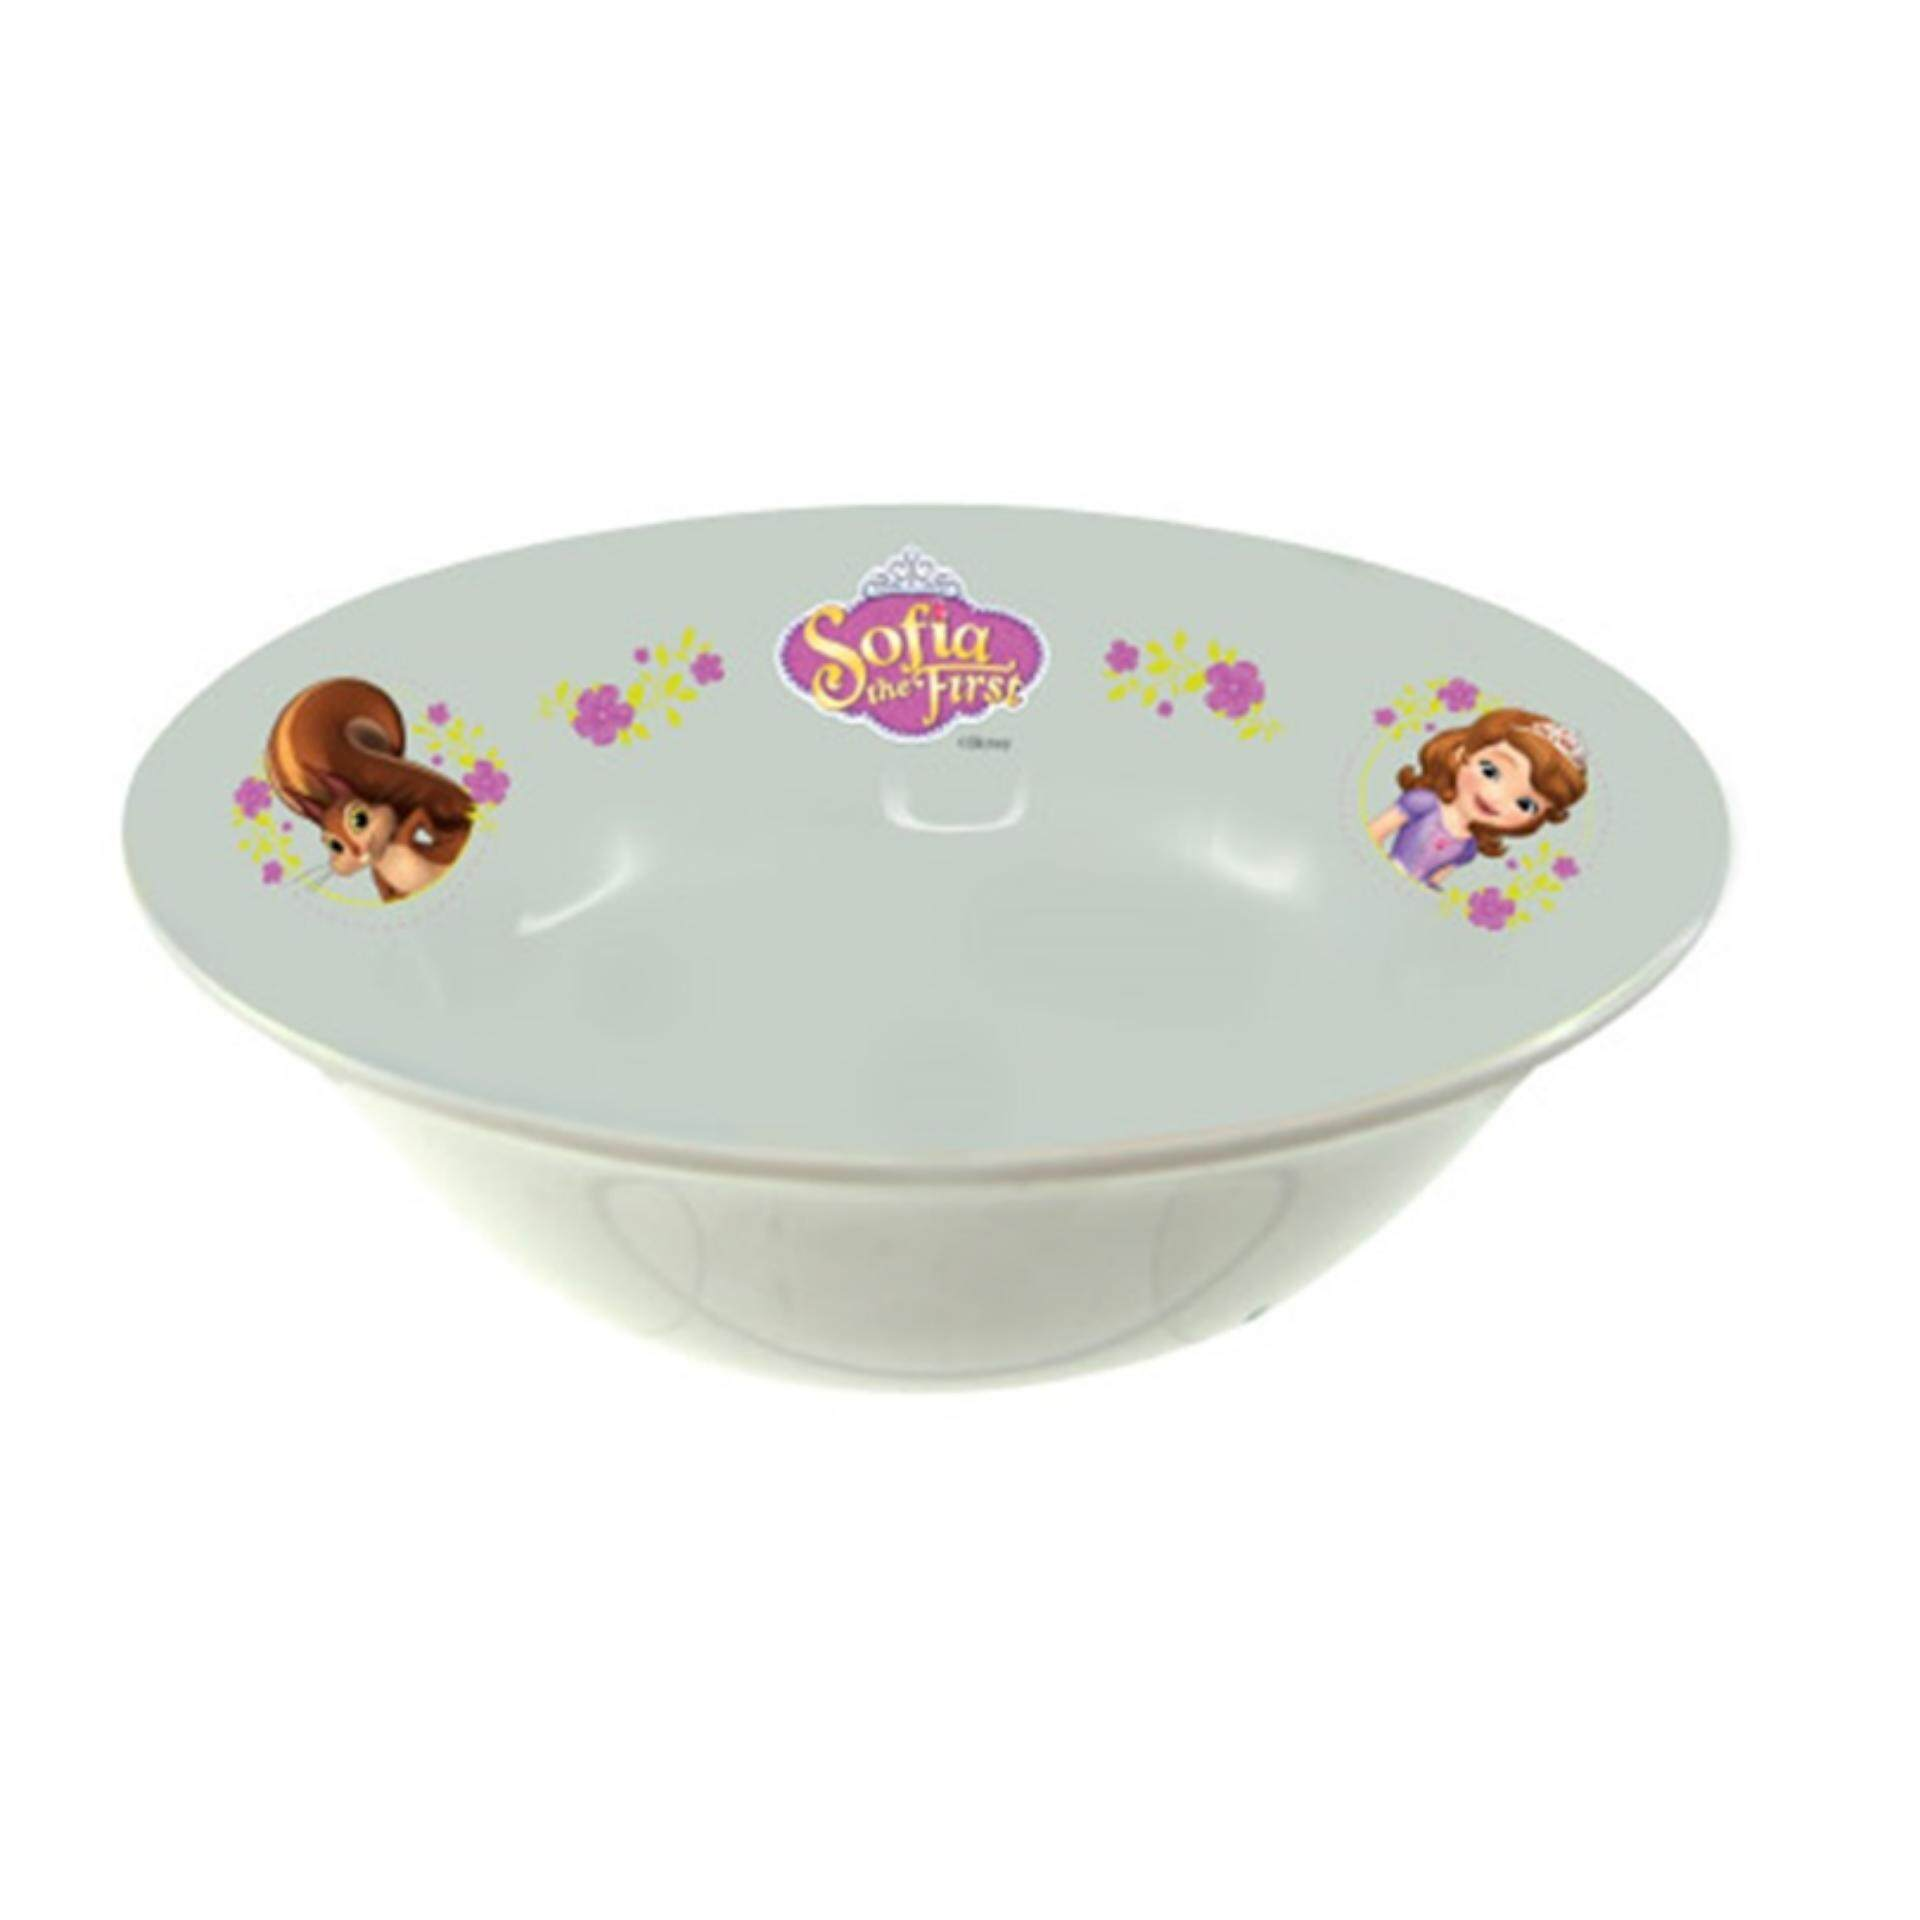 Disney Princess Sofia Soup Bowl 5.5 Inches - White Colour